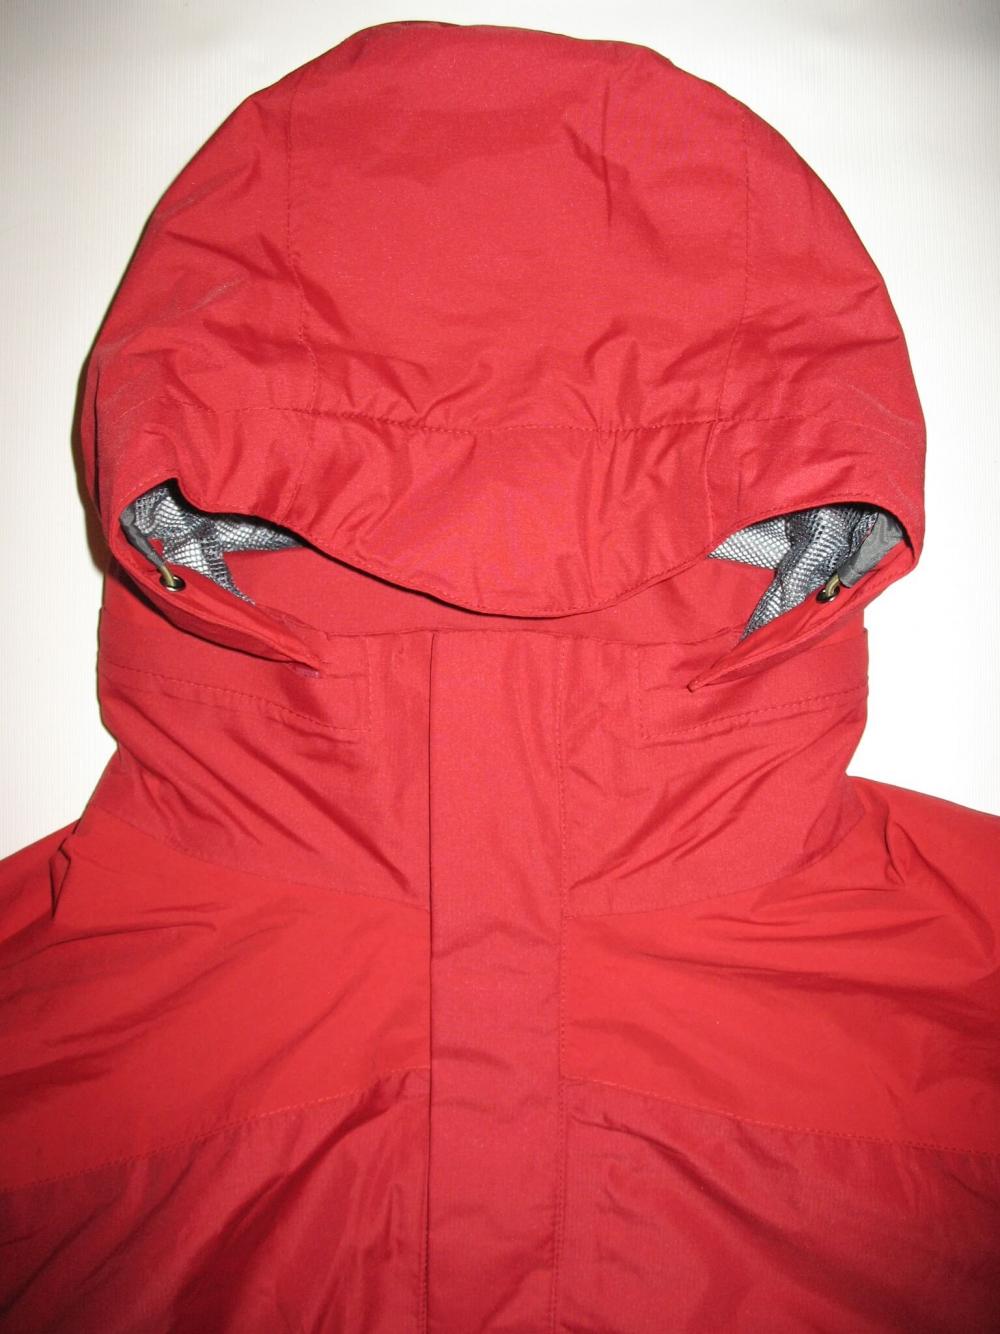 Куртка DIDRIKSONS microtech pro jacket (размер XL) - 2